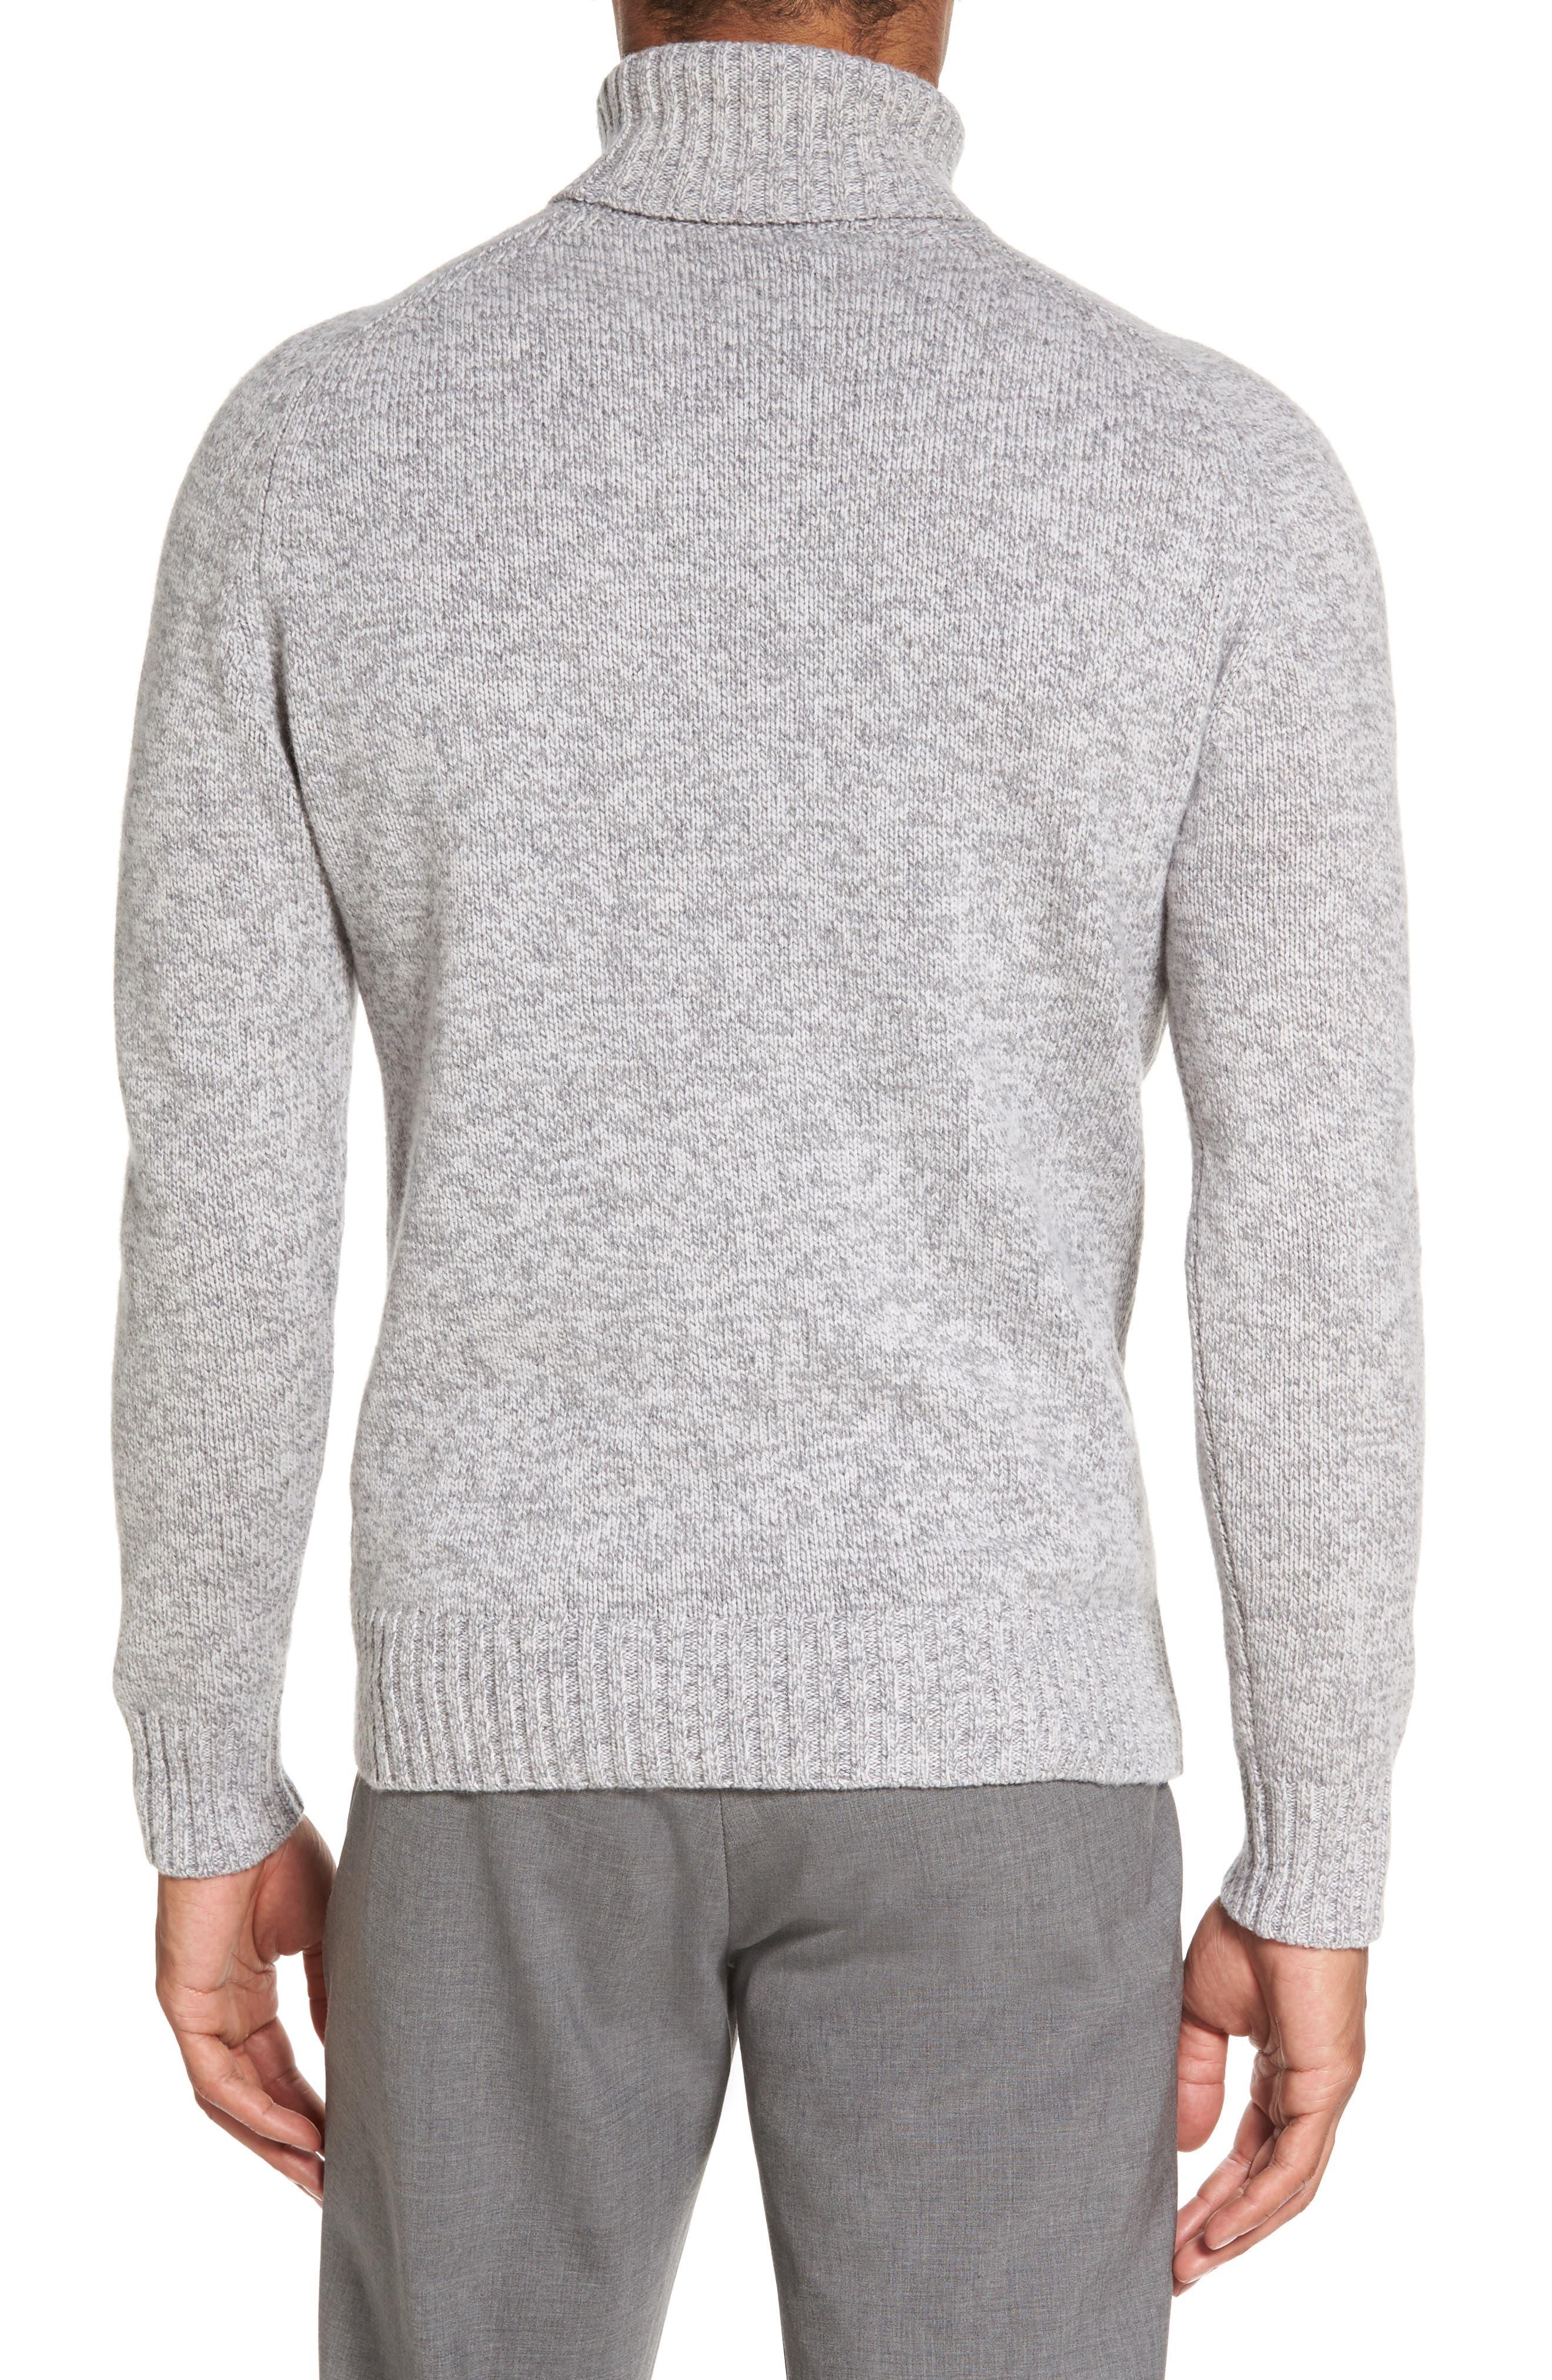 Marled Turtleneck Sweater,                             Alternate thumbnail 2, color,                             054